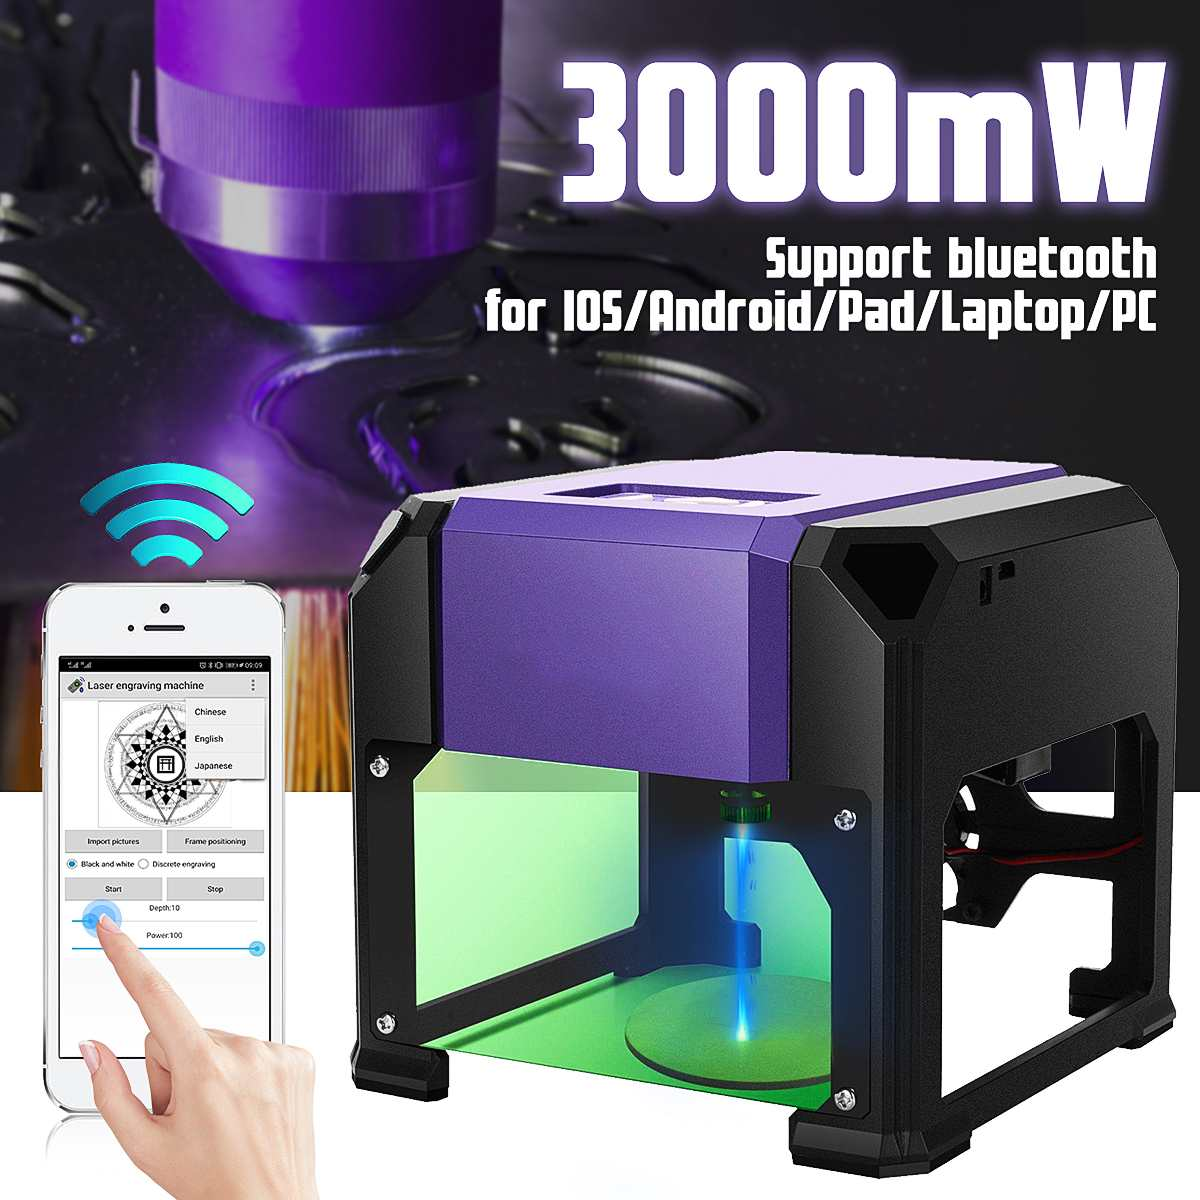 New Upgrade  3000MW Purple CNC Laser Engraving Hine AC 110-220V DIY Engraver Desktop Wood Router/Cutter/Printer